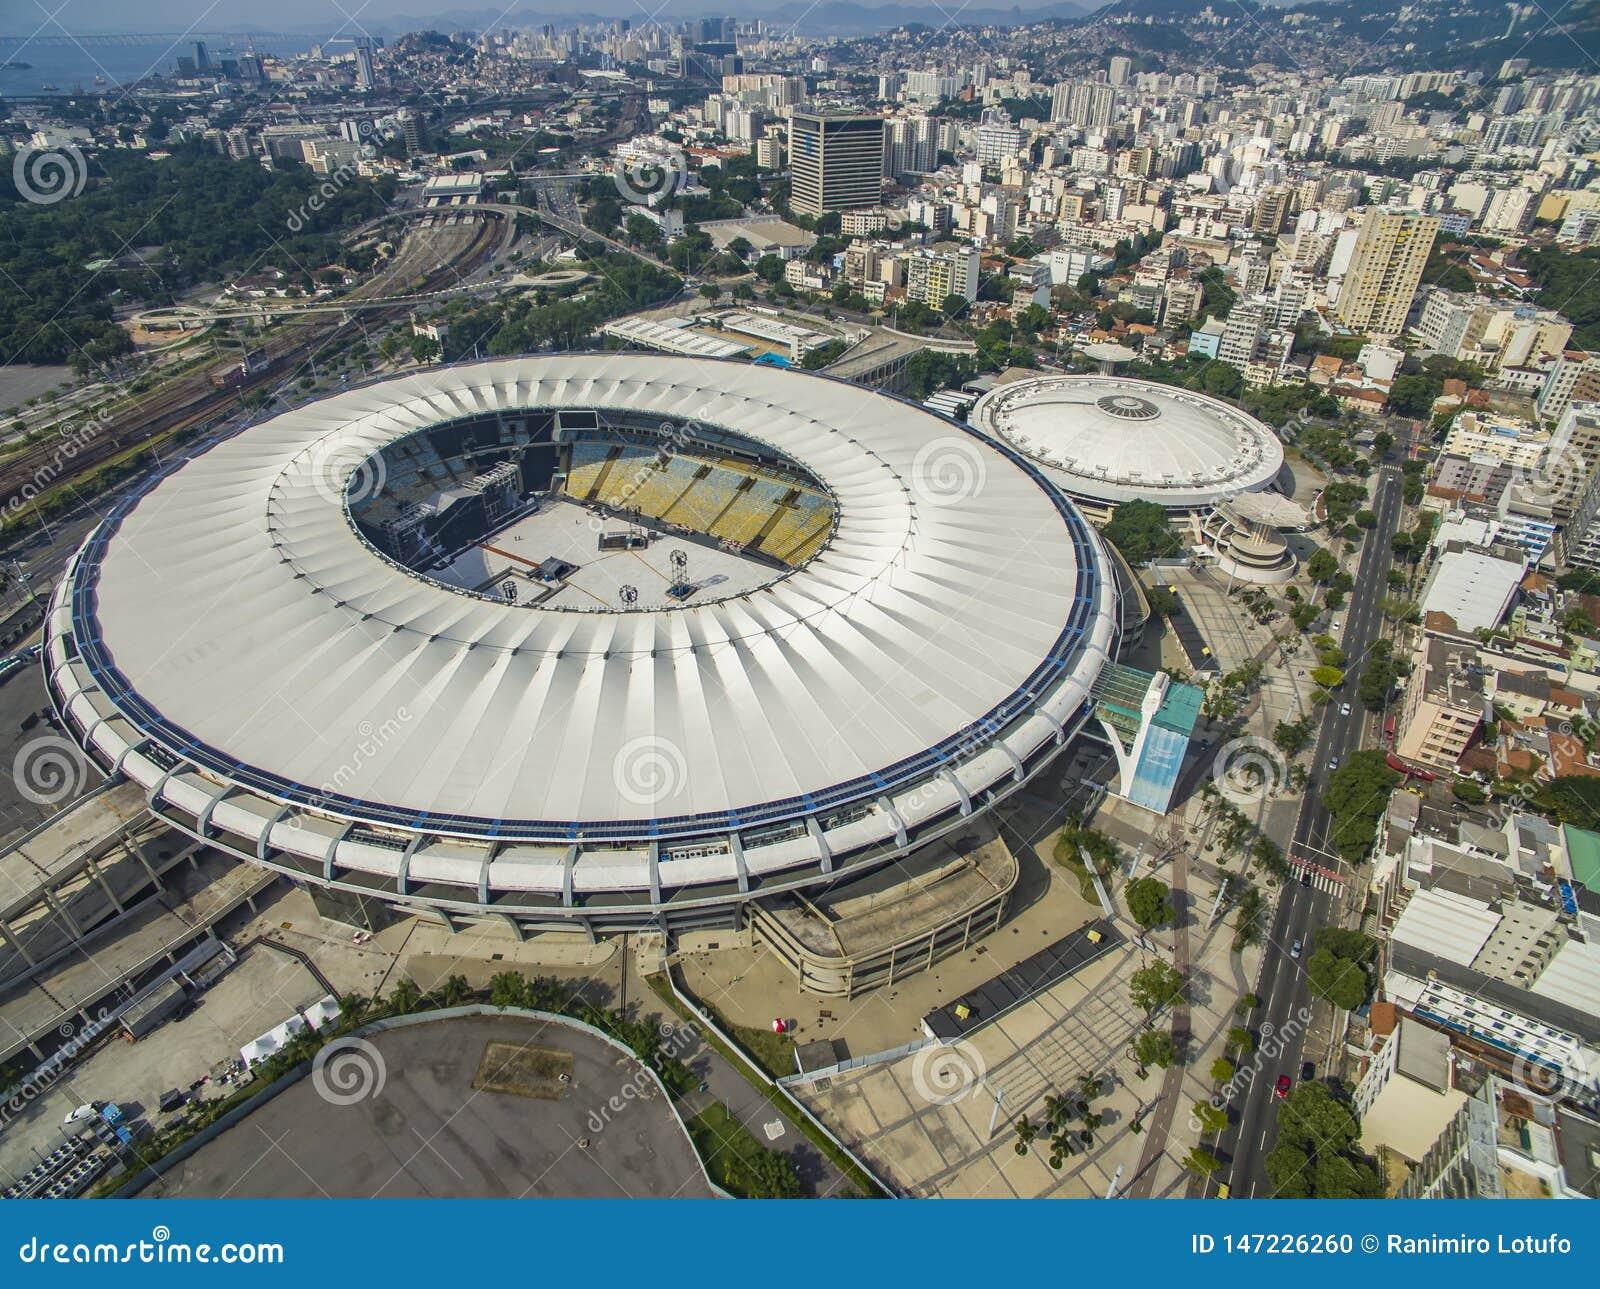 Estadio de Maracana F?tbol brasile?o Ciudad de Rio de Janeiro, el Brasil Suram?rica